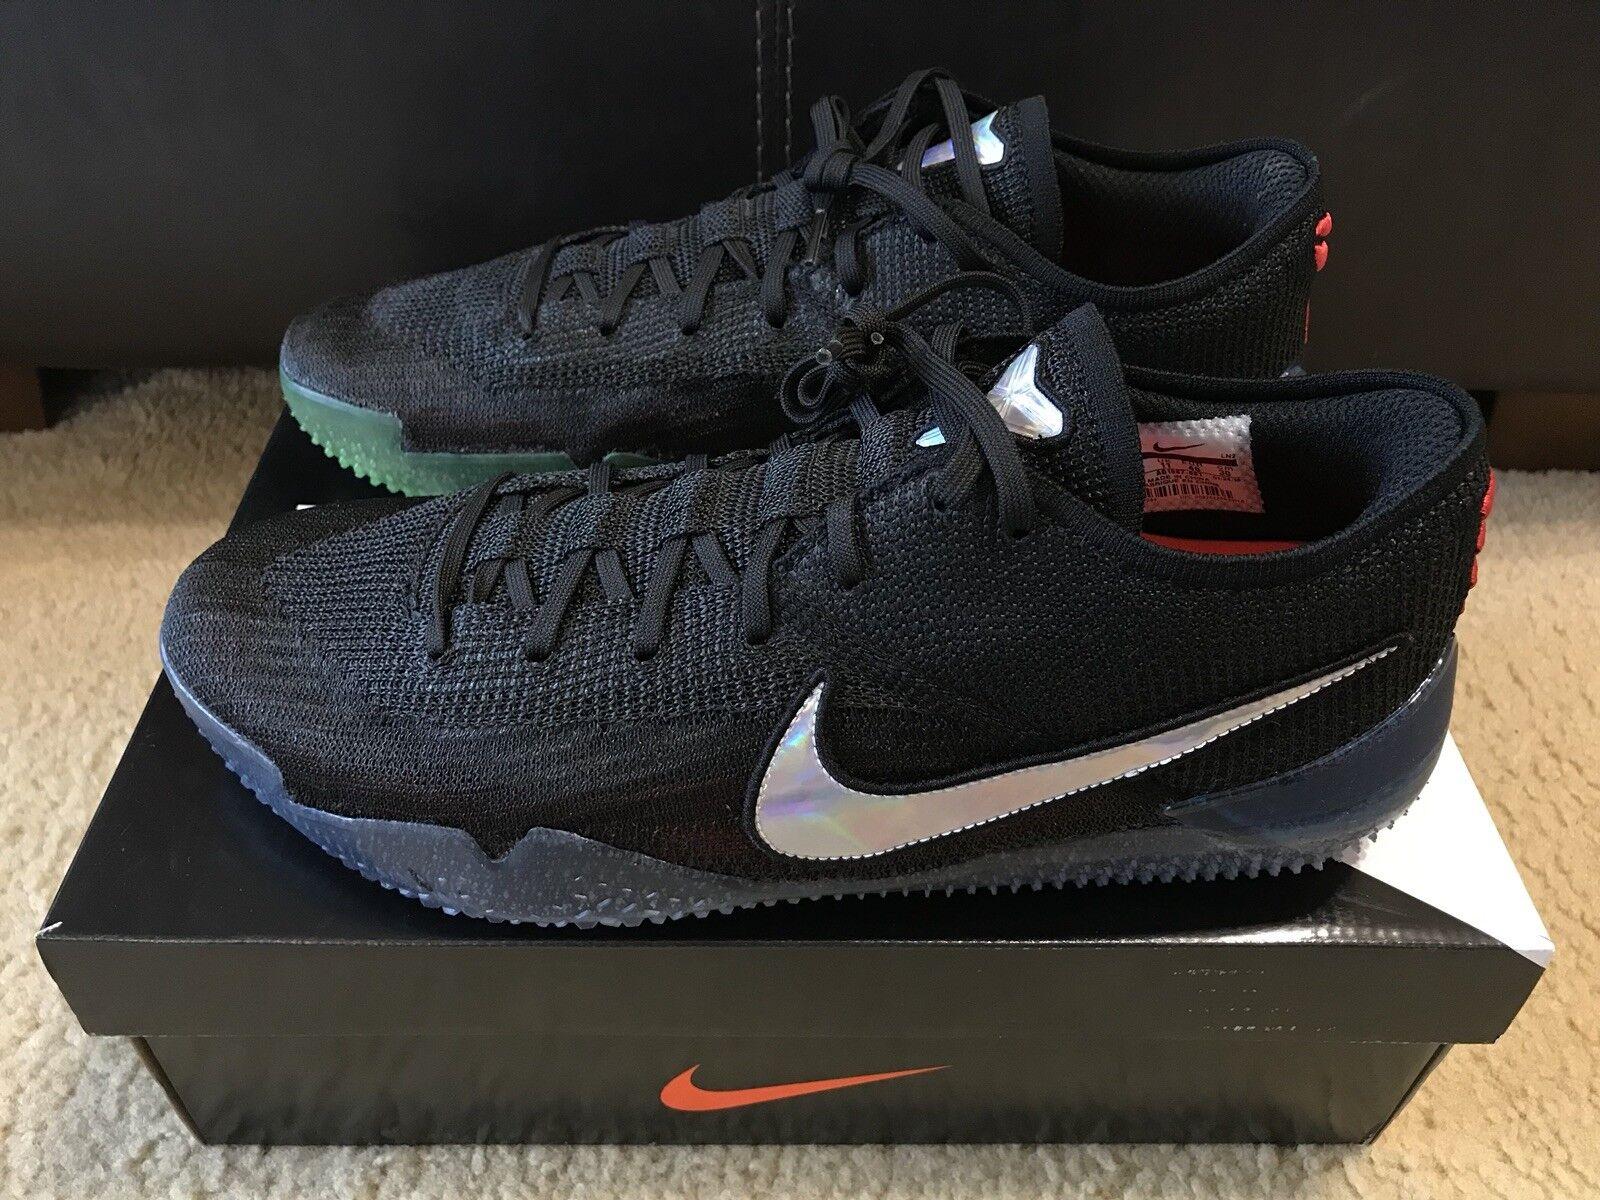 Nike Kobe AD NXT 360 MAMBA DAY Men's sz 12 Black Basketball shoes AQ1087 001